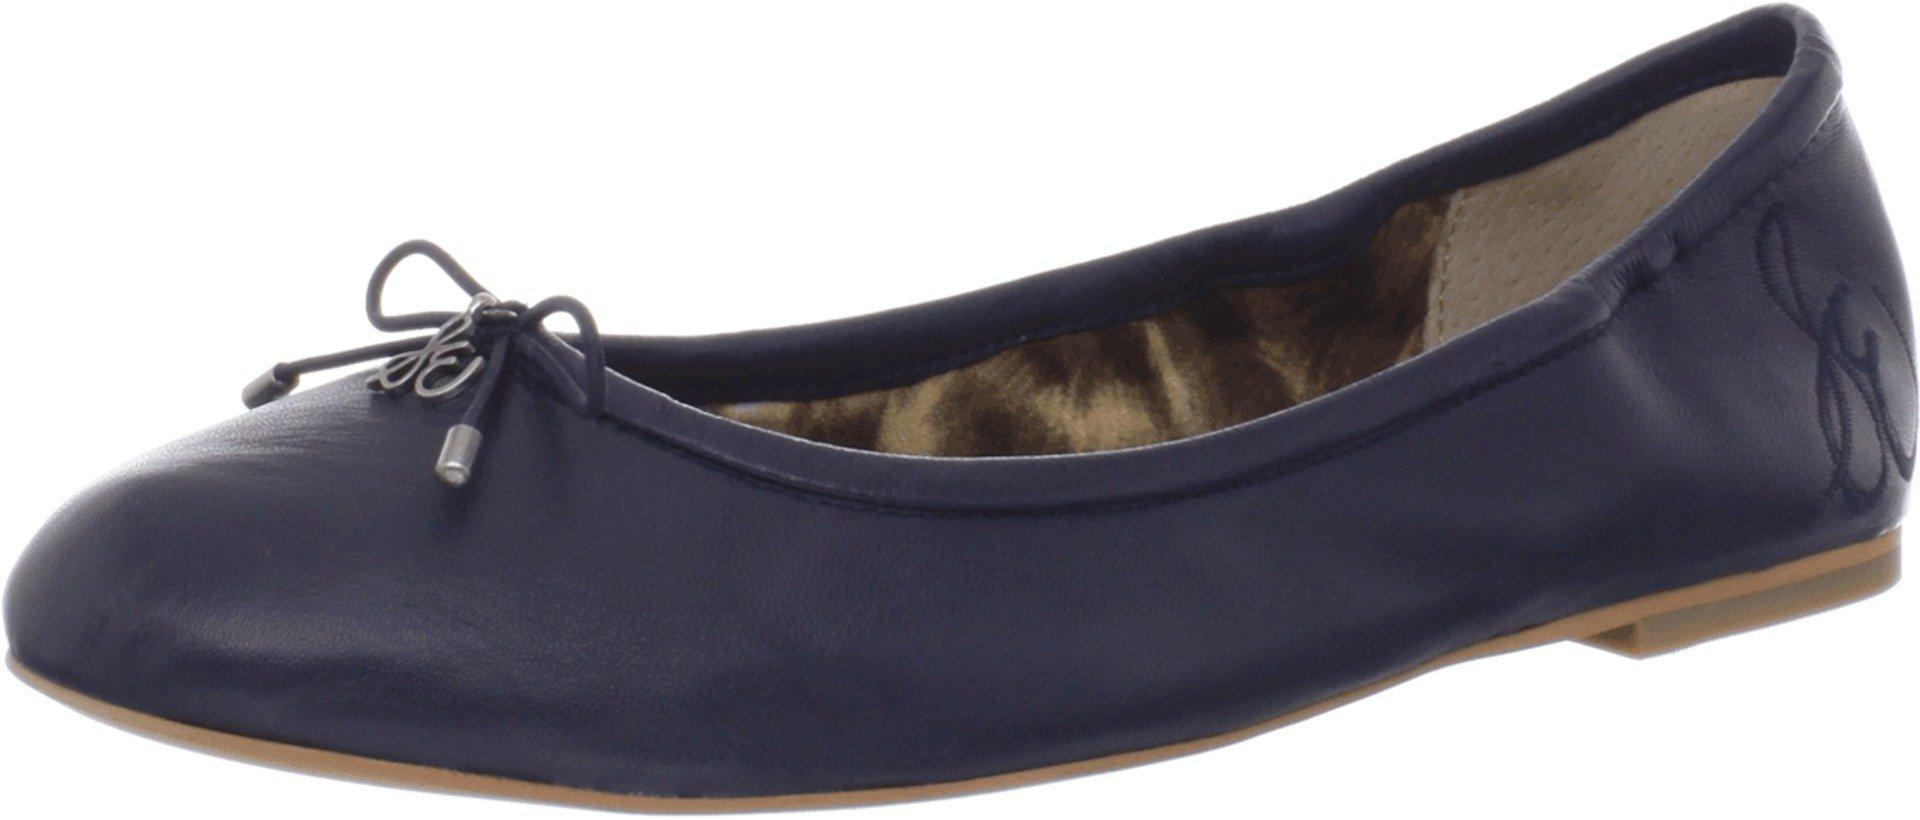 Sam Edelman Women's Felicia Ballet Flat, Navy Leather, 7 Wide US